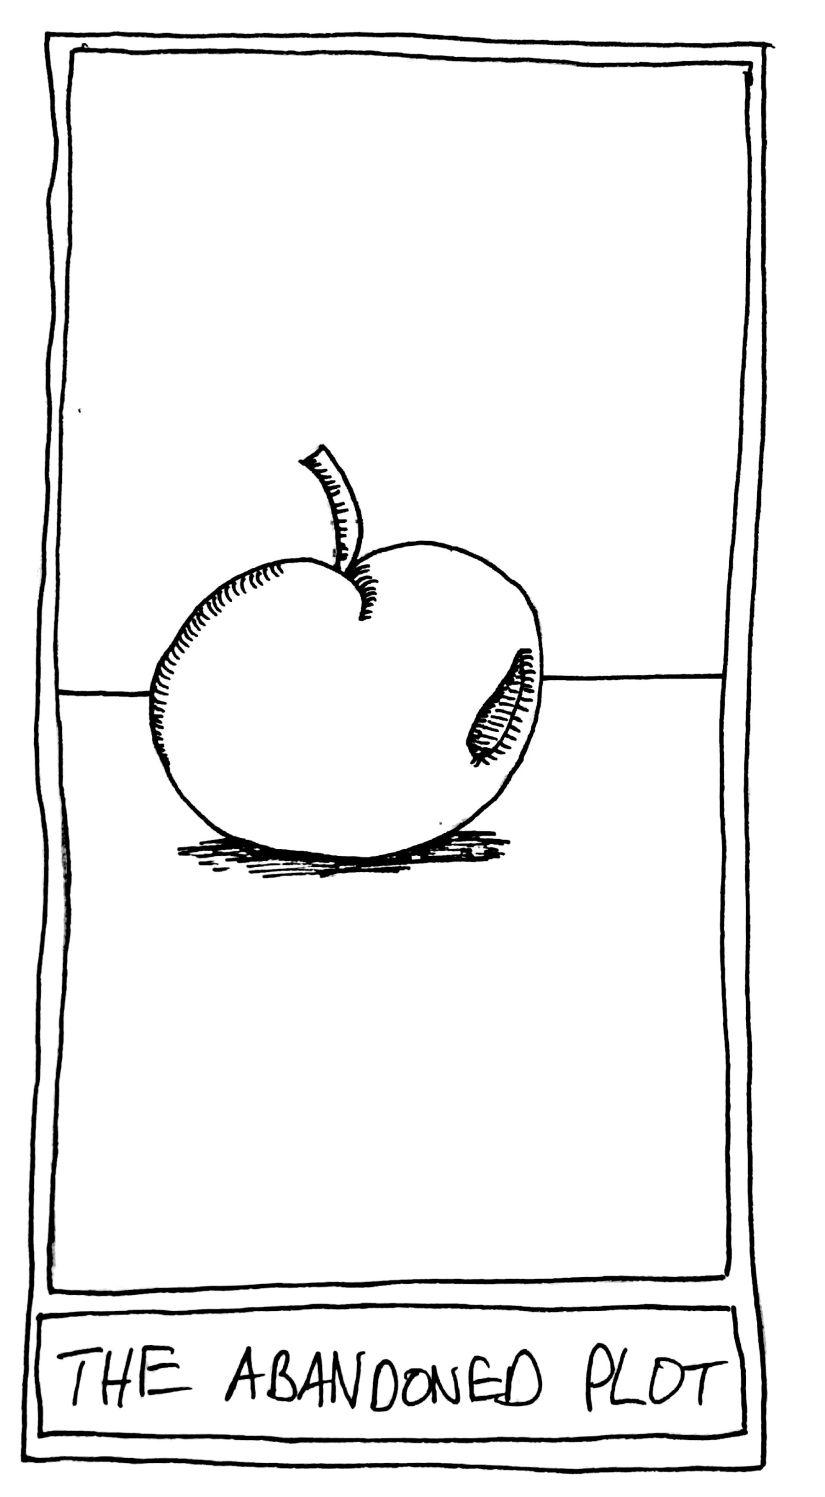 The Mislaid Deck: Card  34 – The AbandonedPlot